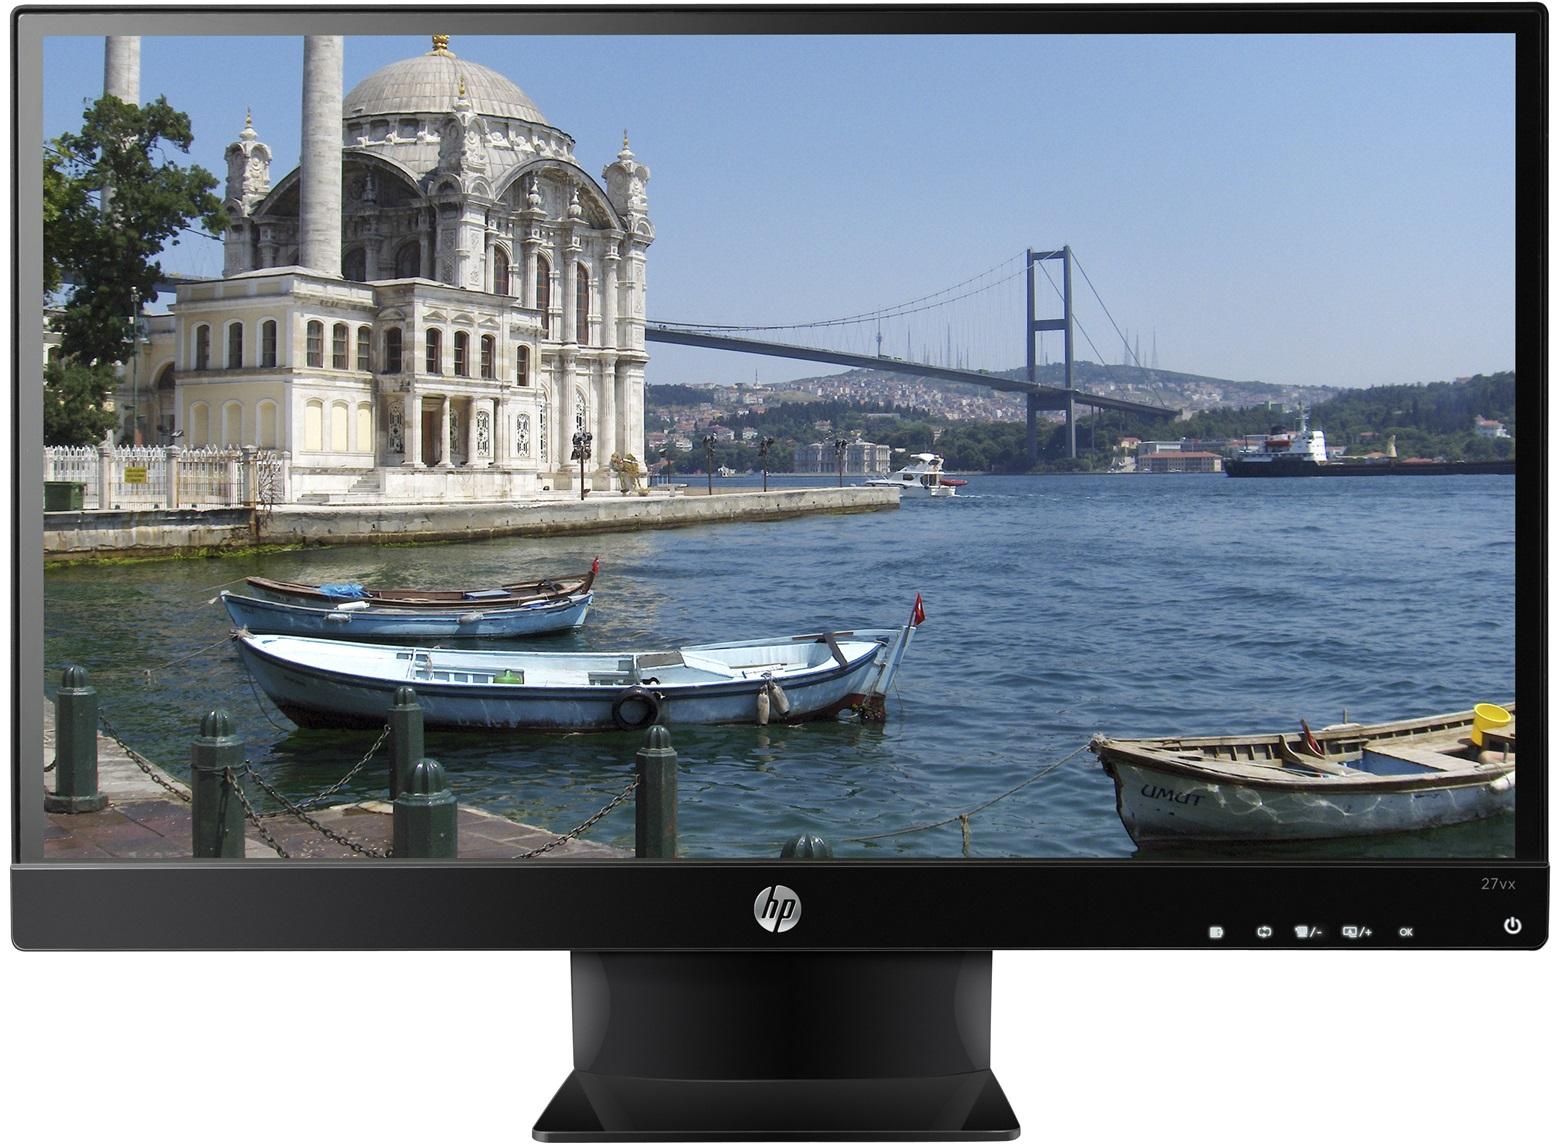 "HP 27vx 27"" Black Full HD"